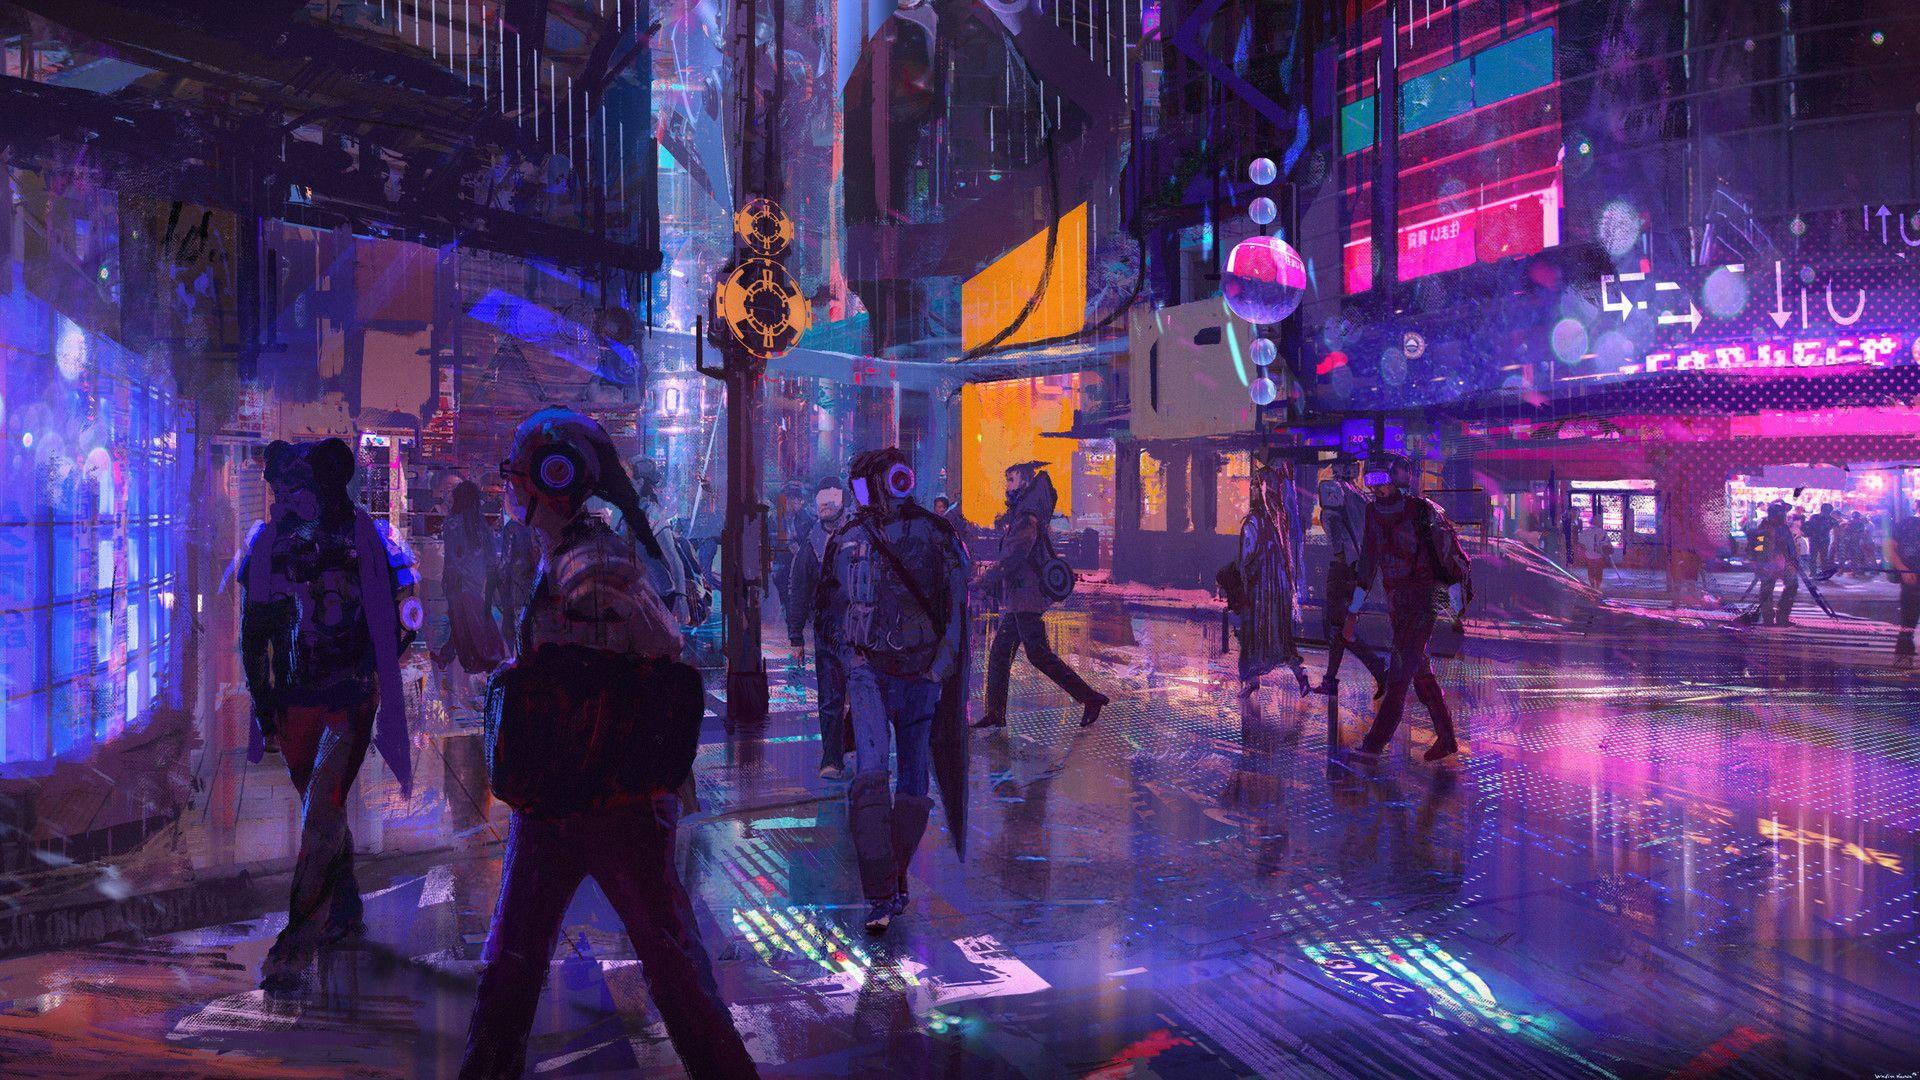 cyberpunk landscape wallpaper